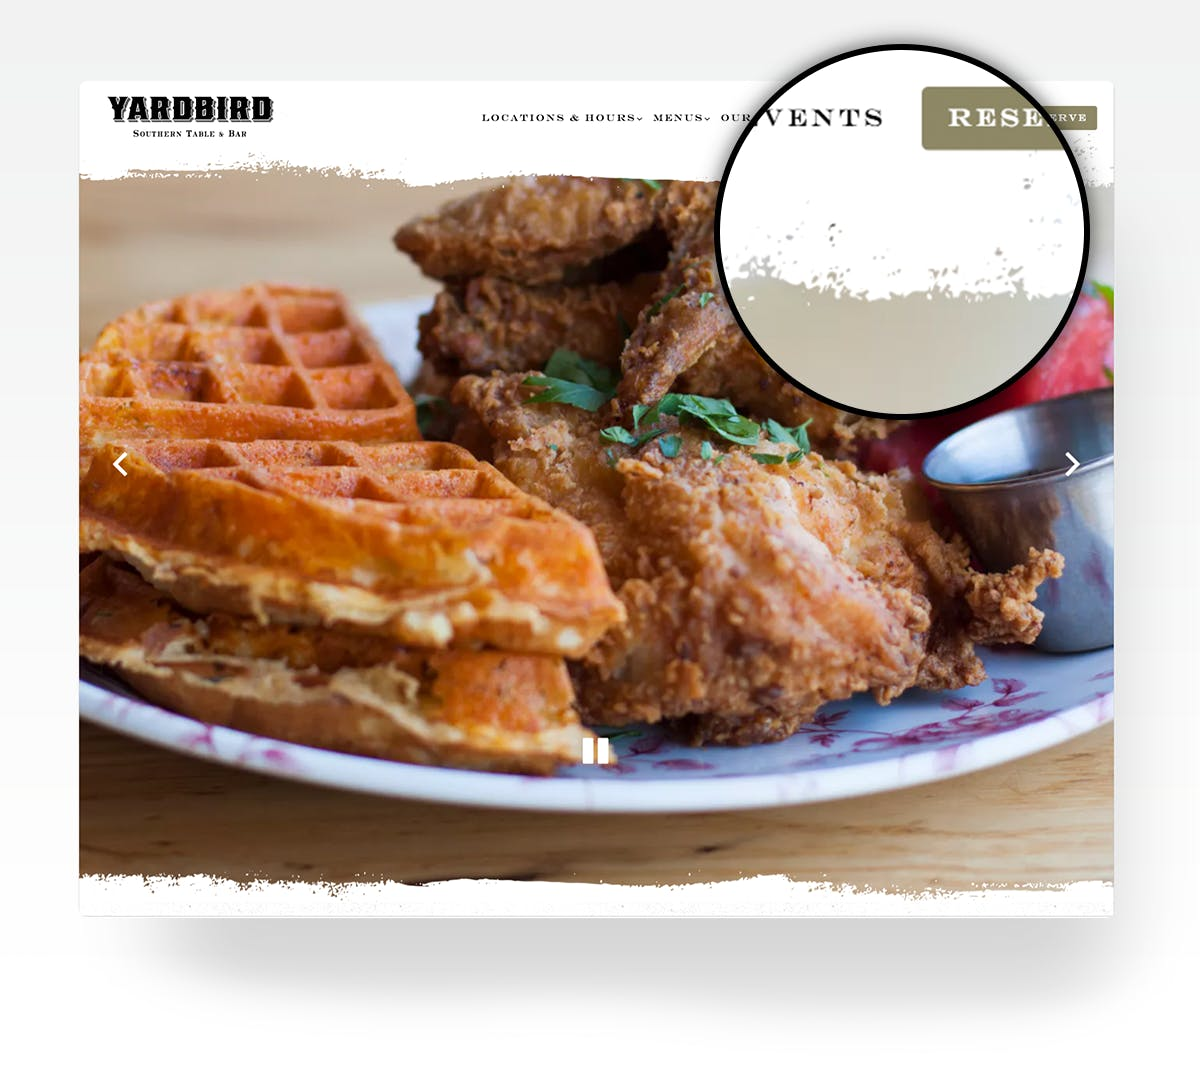 Yardbird's website